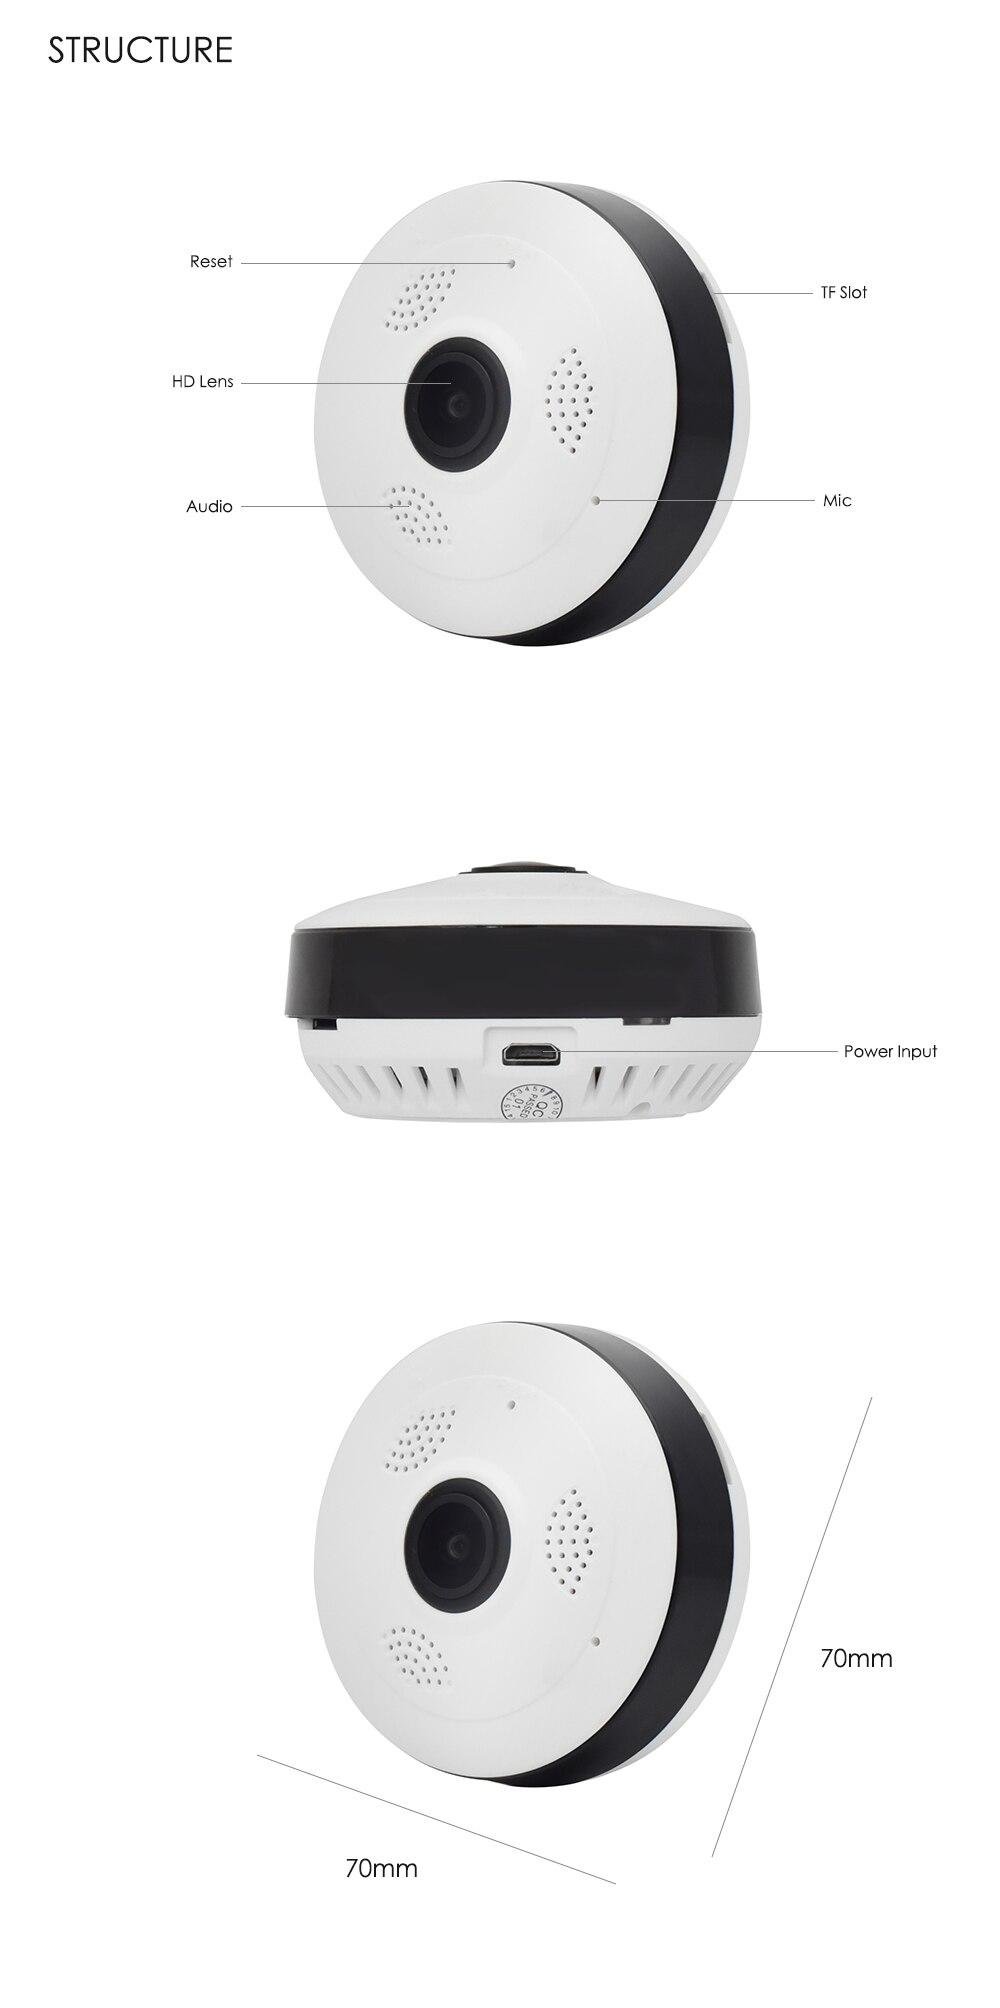 Wistino CCTV HD 960P WIFI IP Camera Alarm Wireless VR Panoramic Camera Fisheye 360 Degree Video Baby Monitor Home Surveillance (14)